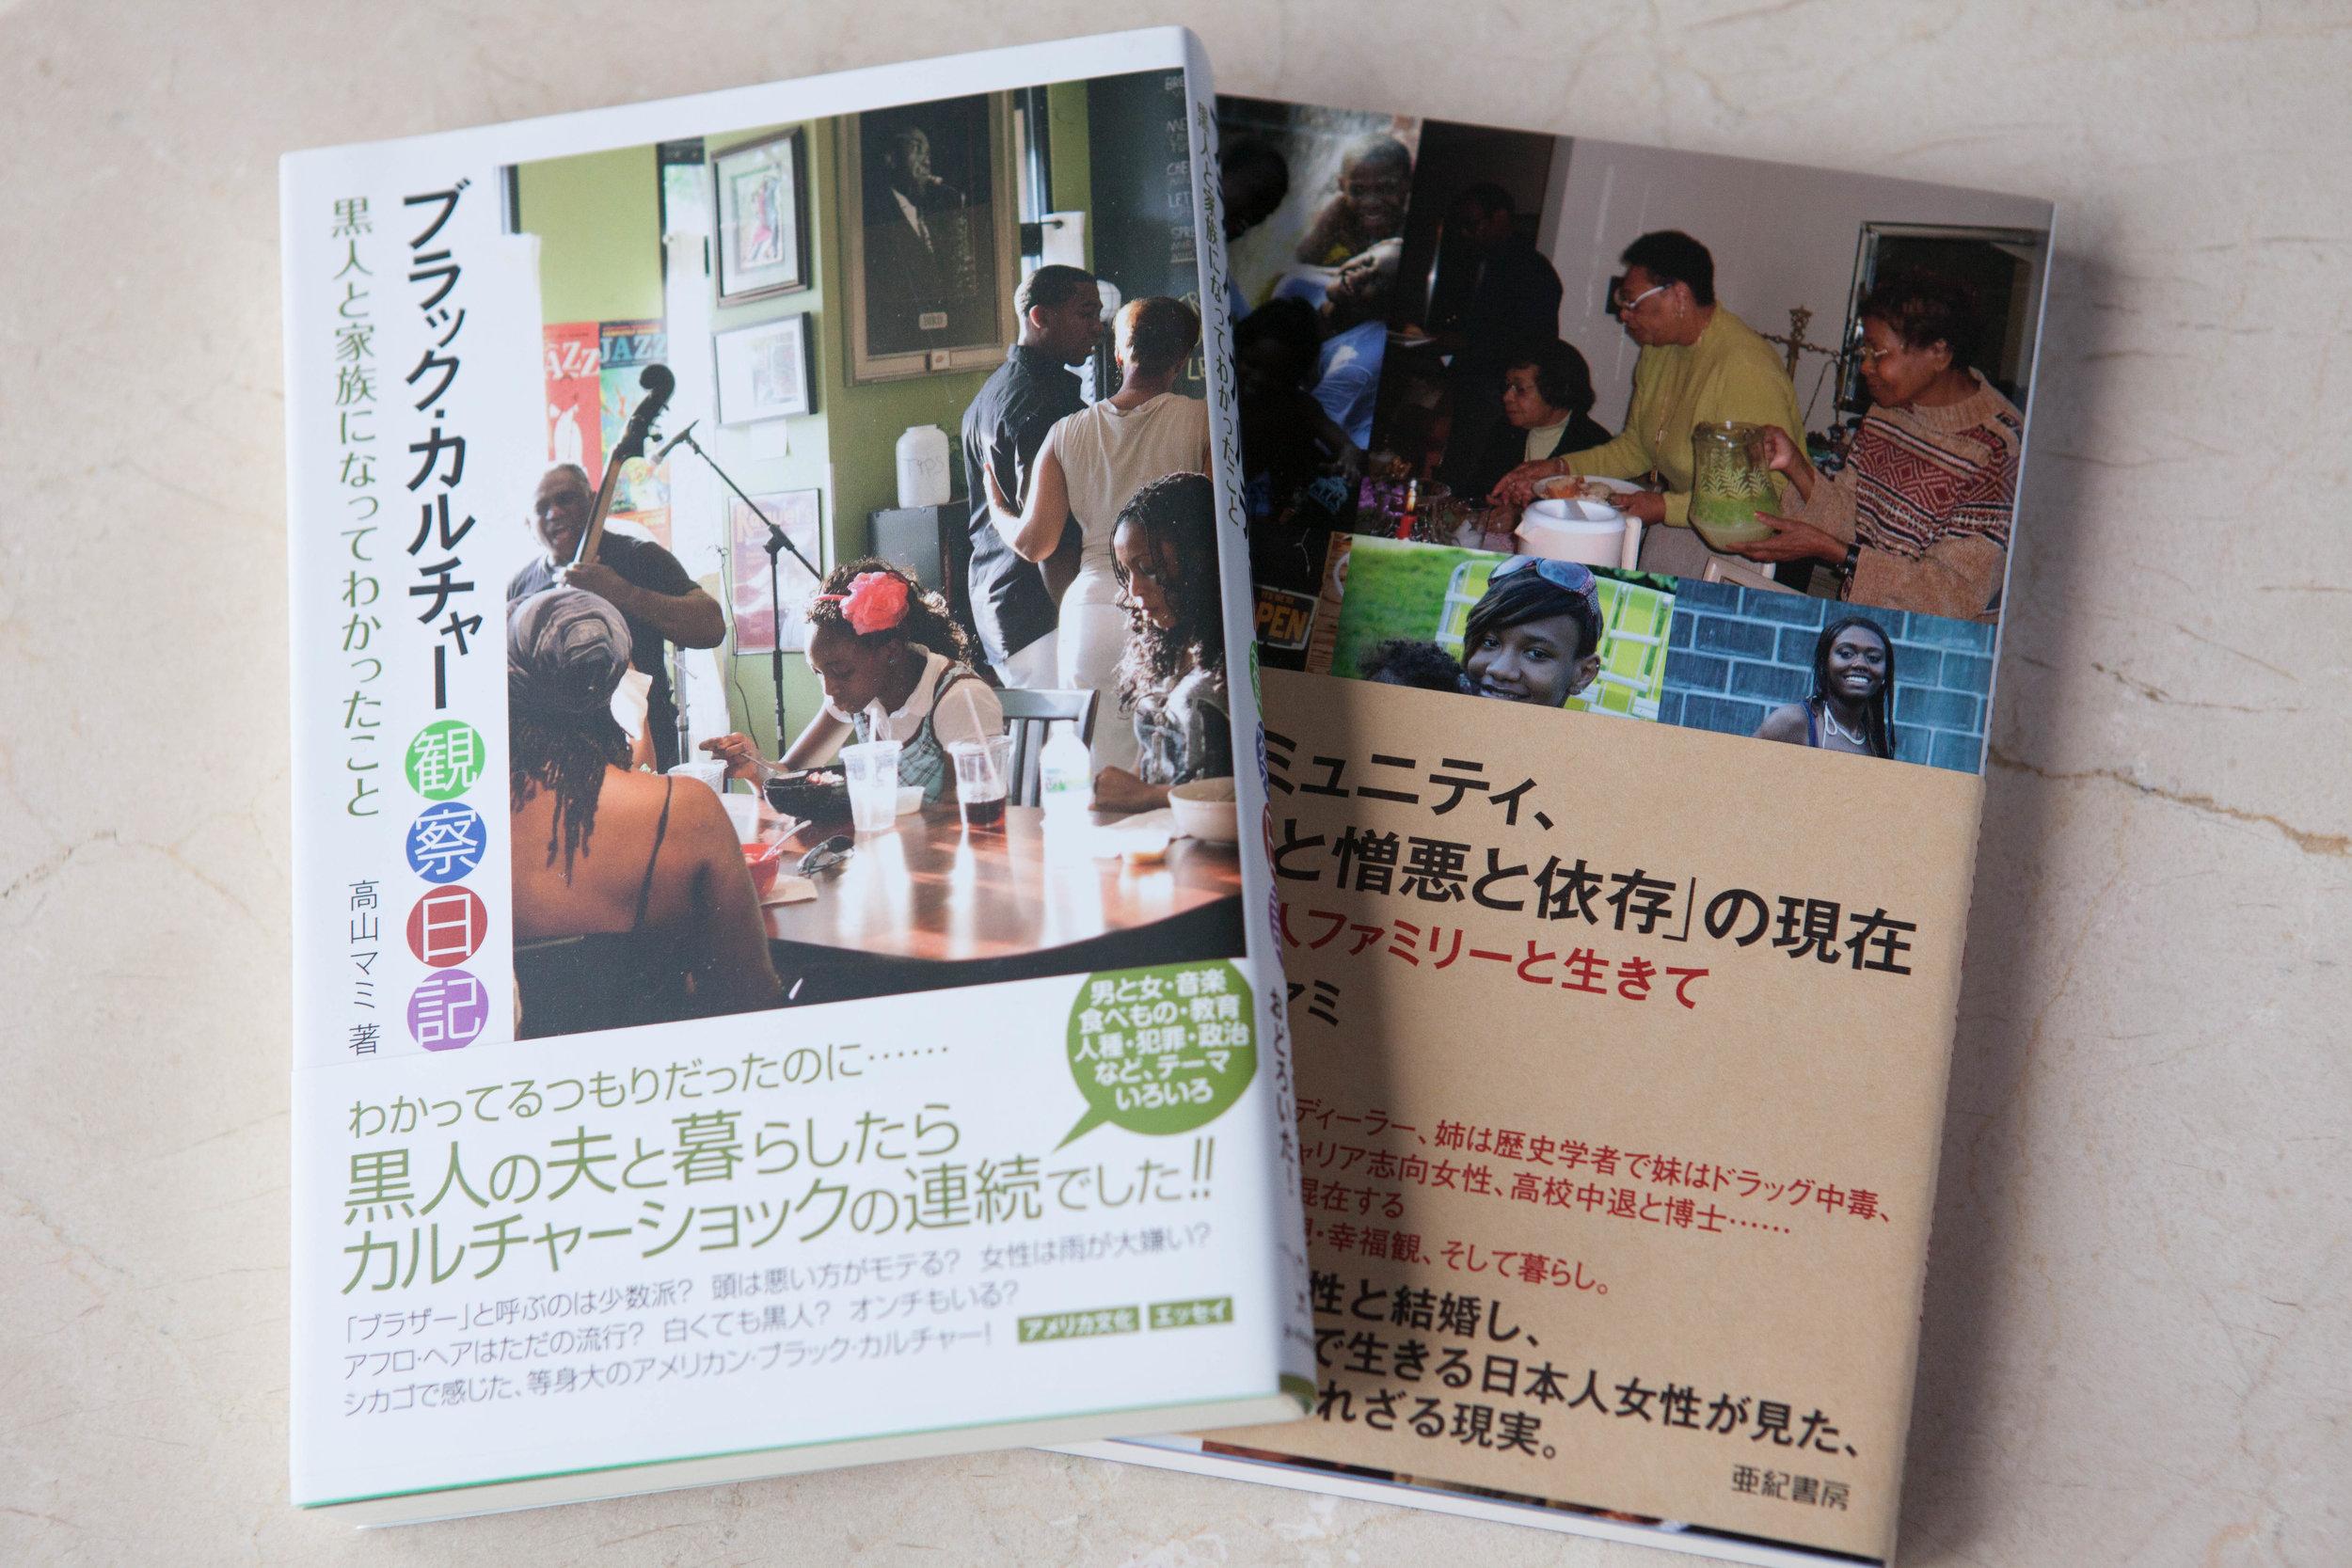 jmt books.jpg